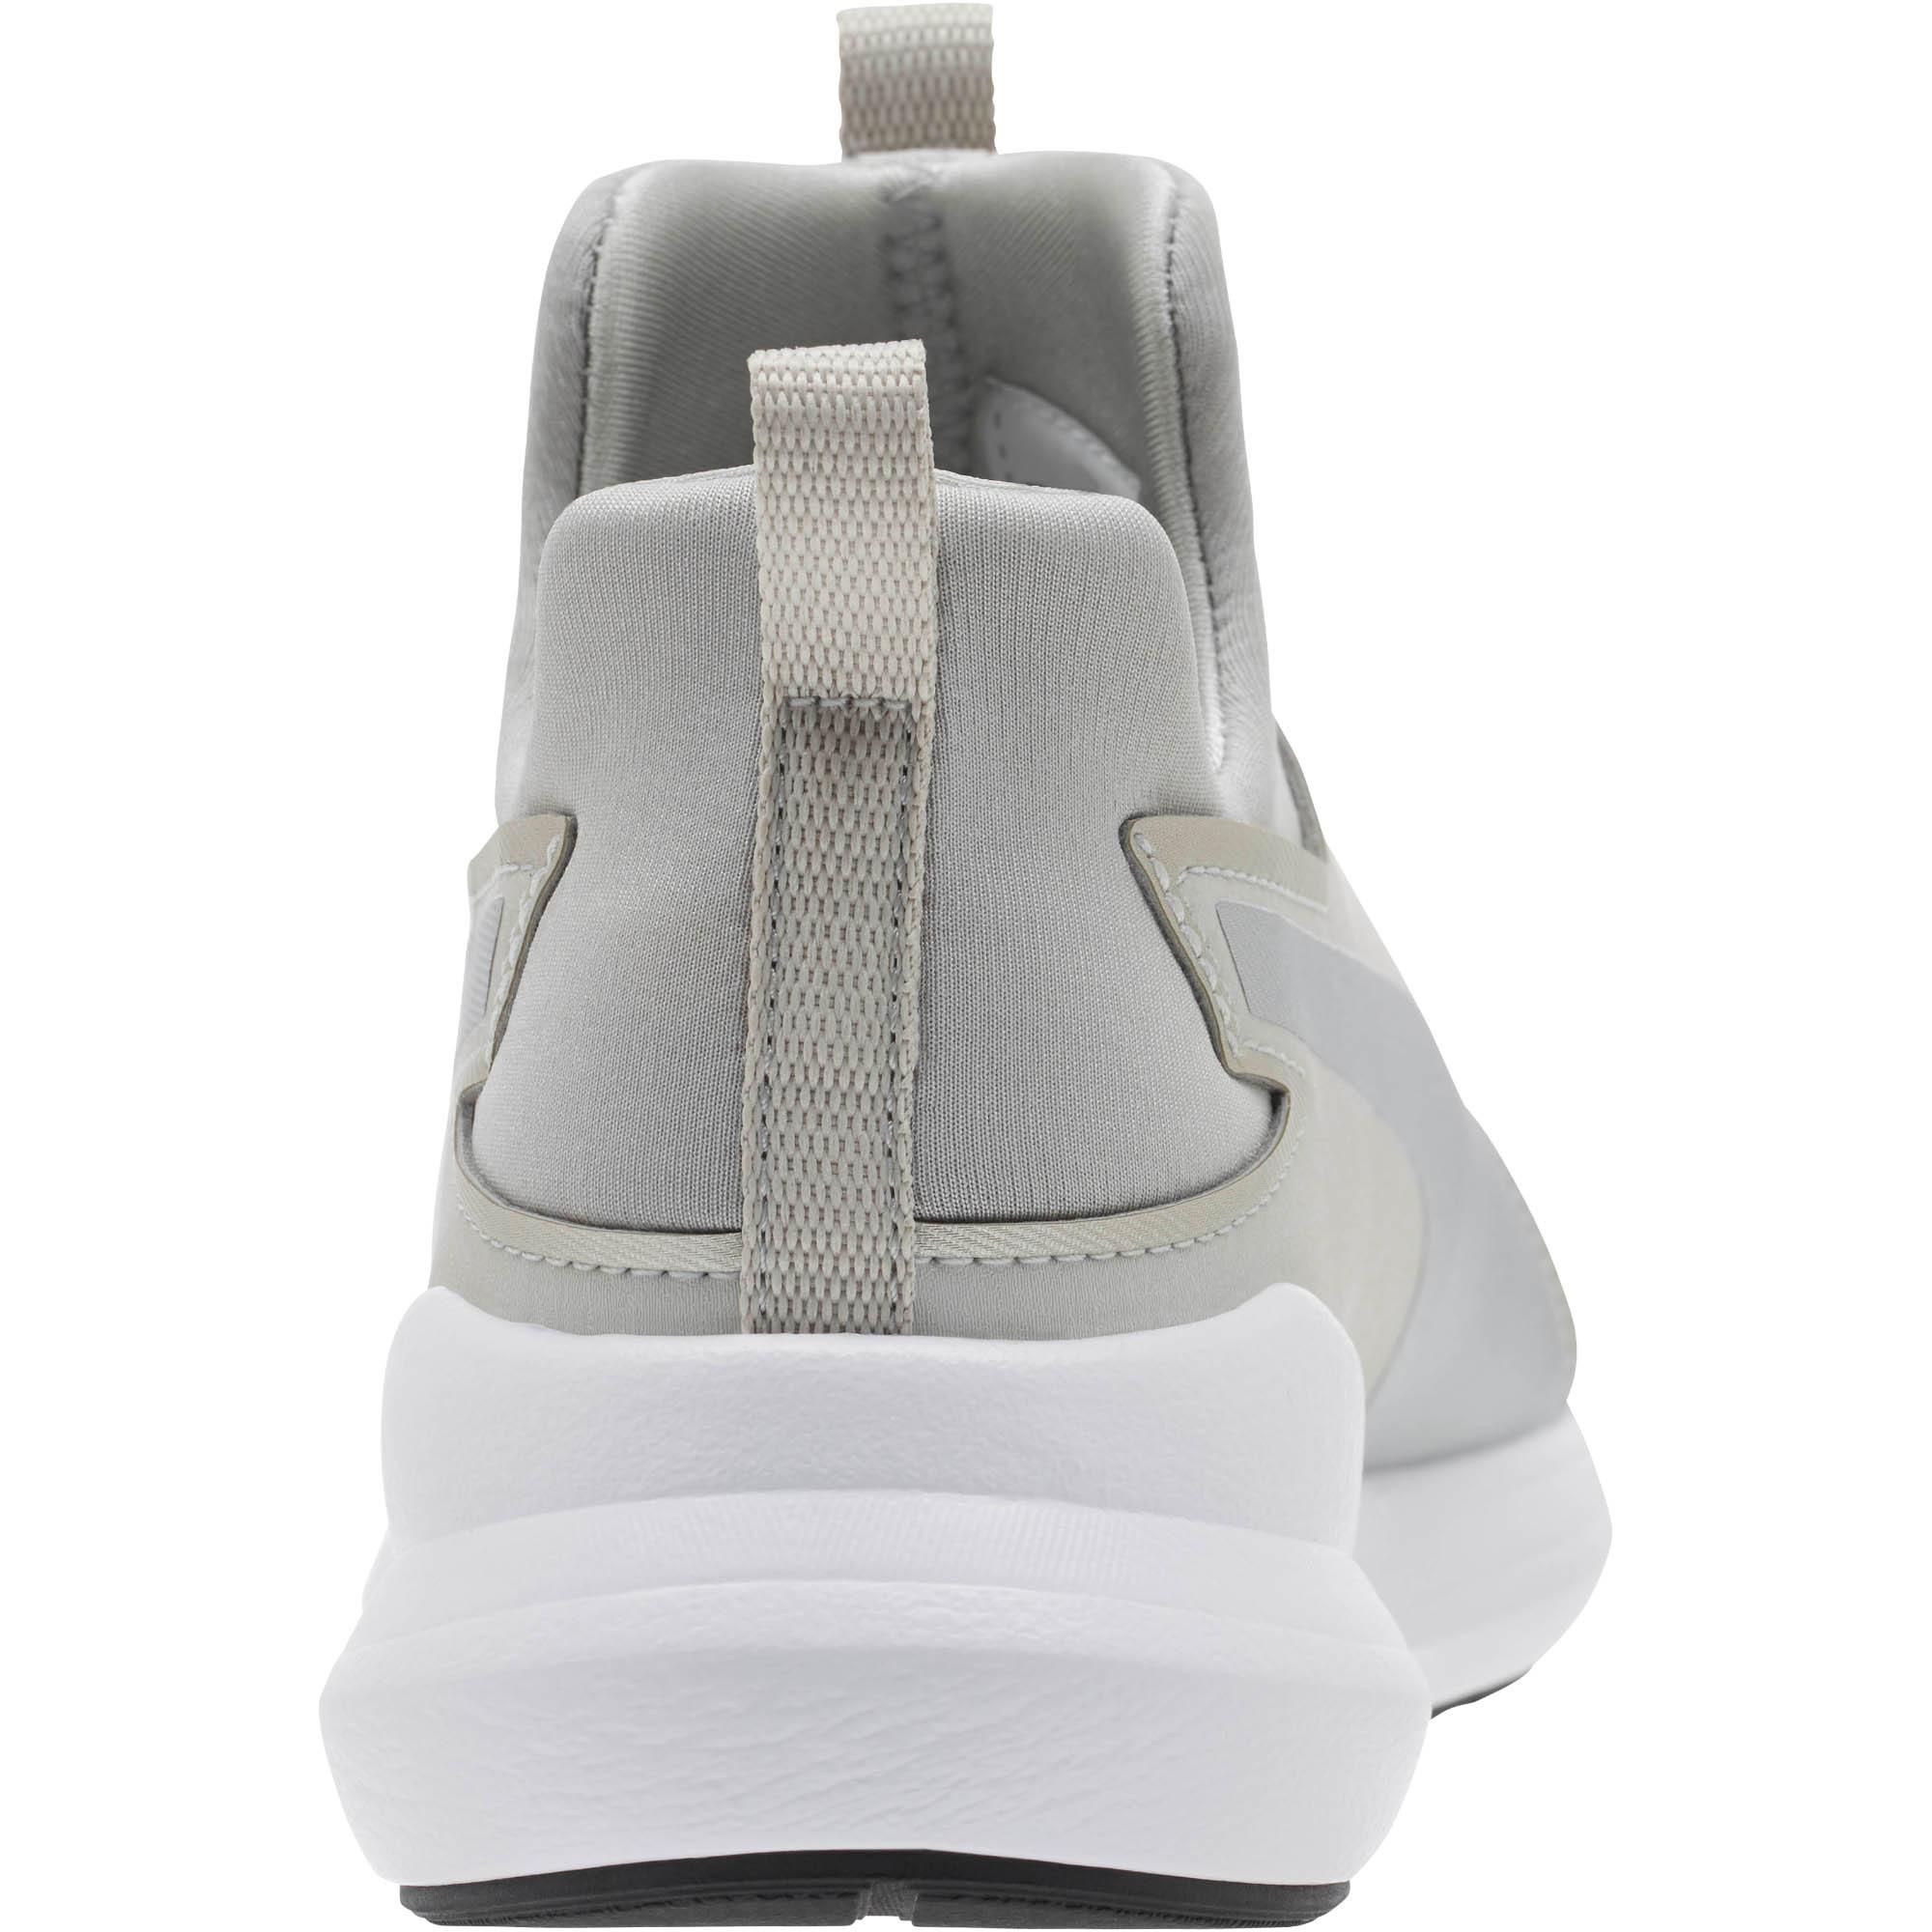 6ab31d041db Official Puma Store  Puma Rebel Mid Glow JR Sneakers